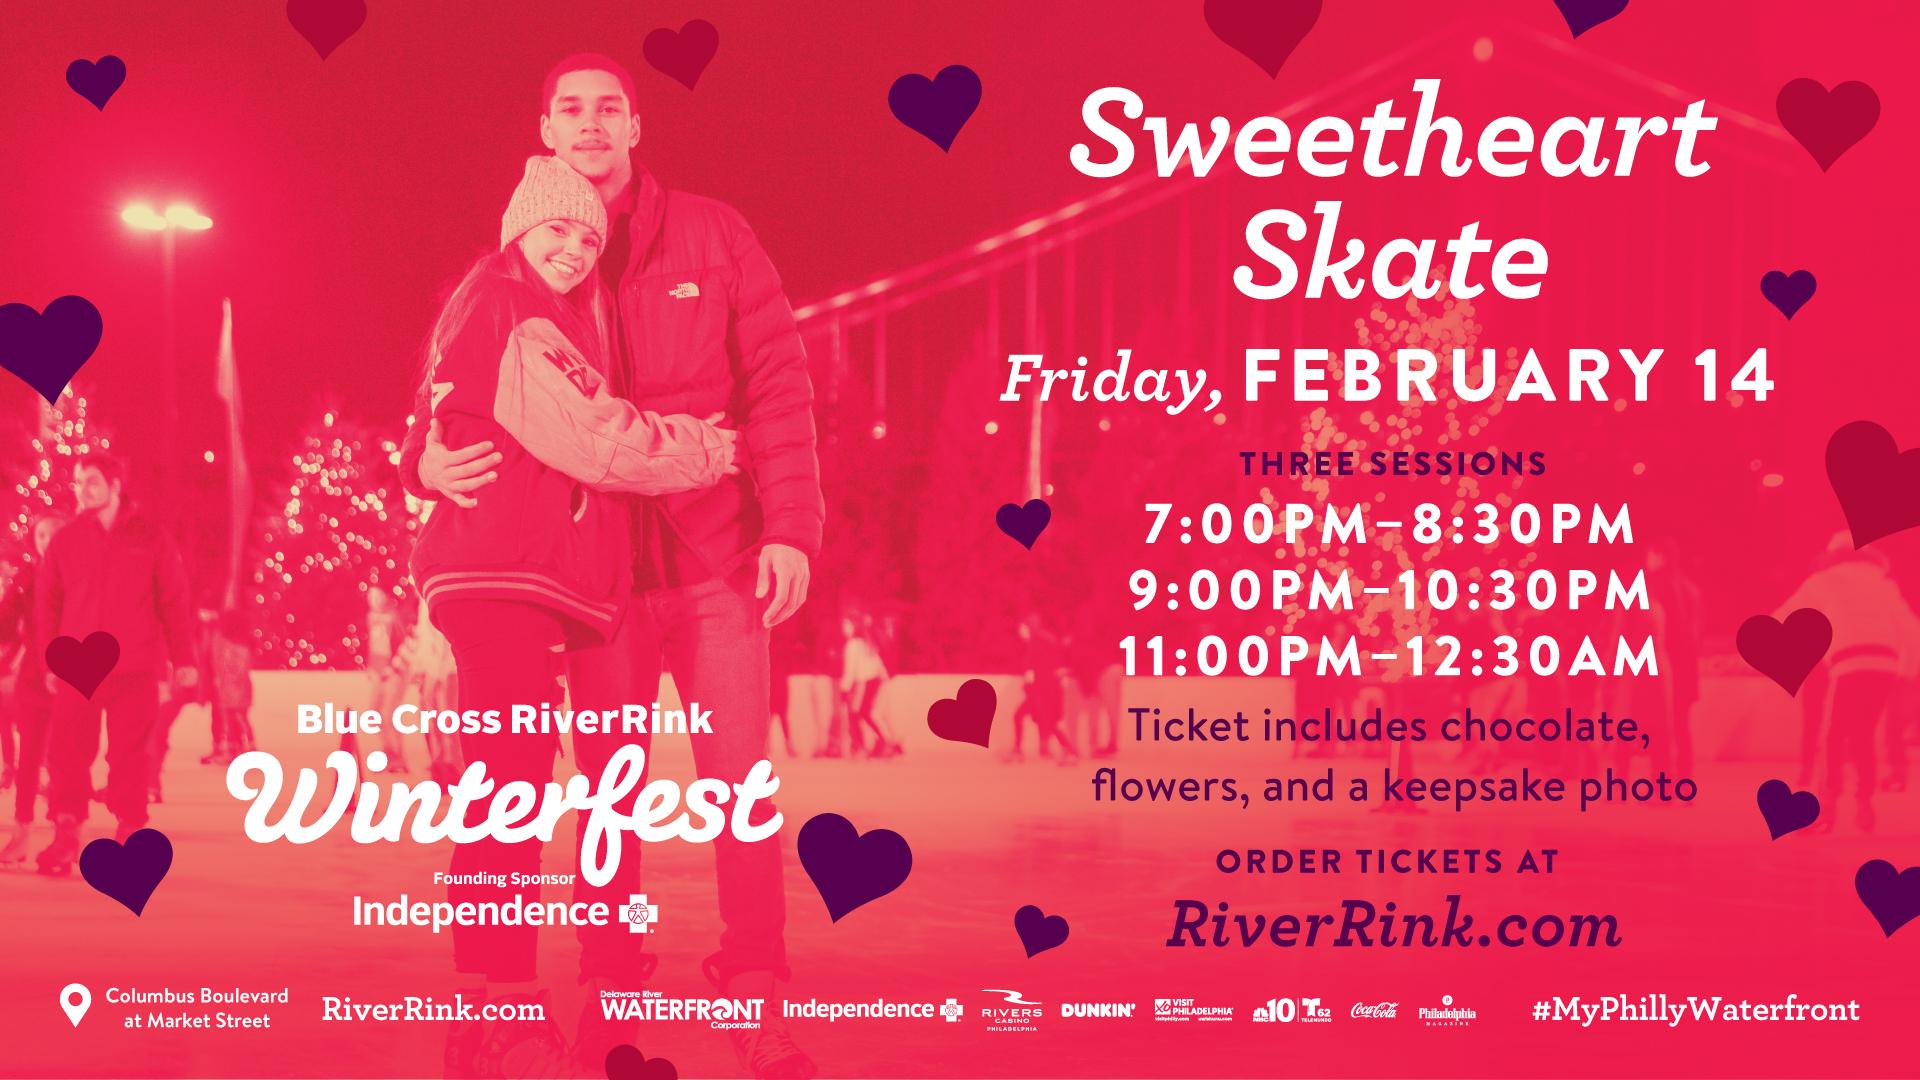 DRWC_Wint2019_Sweetheart-Skate_1920x1080-1